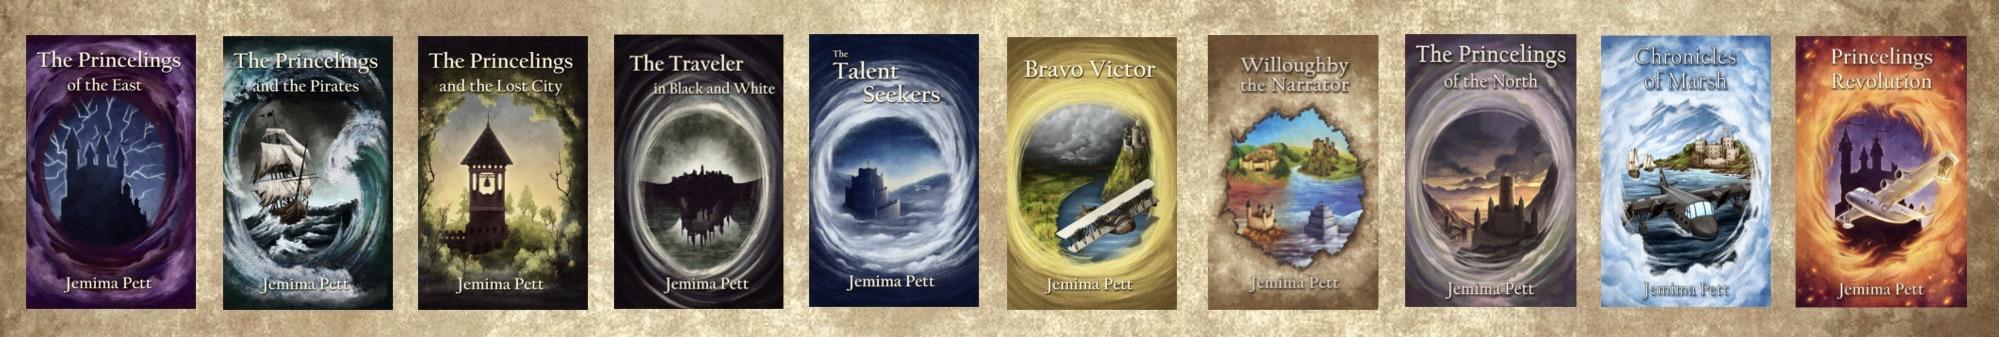 10 Princelings book covers